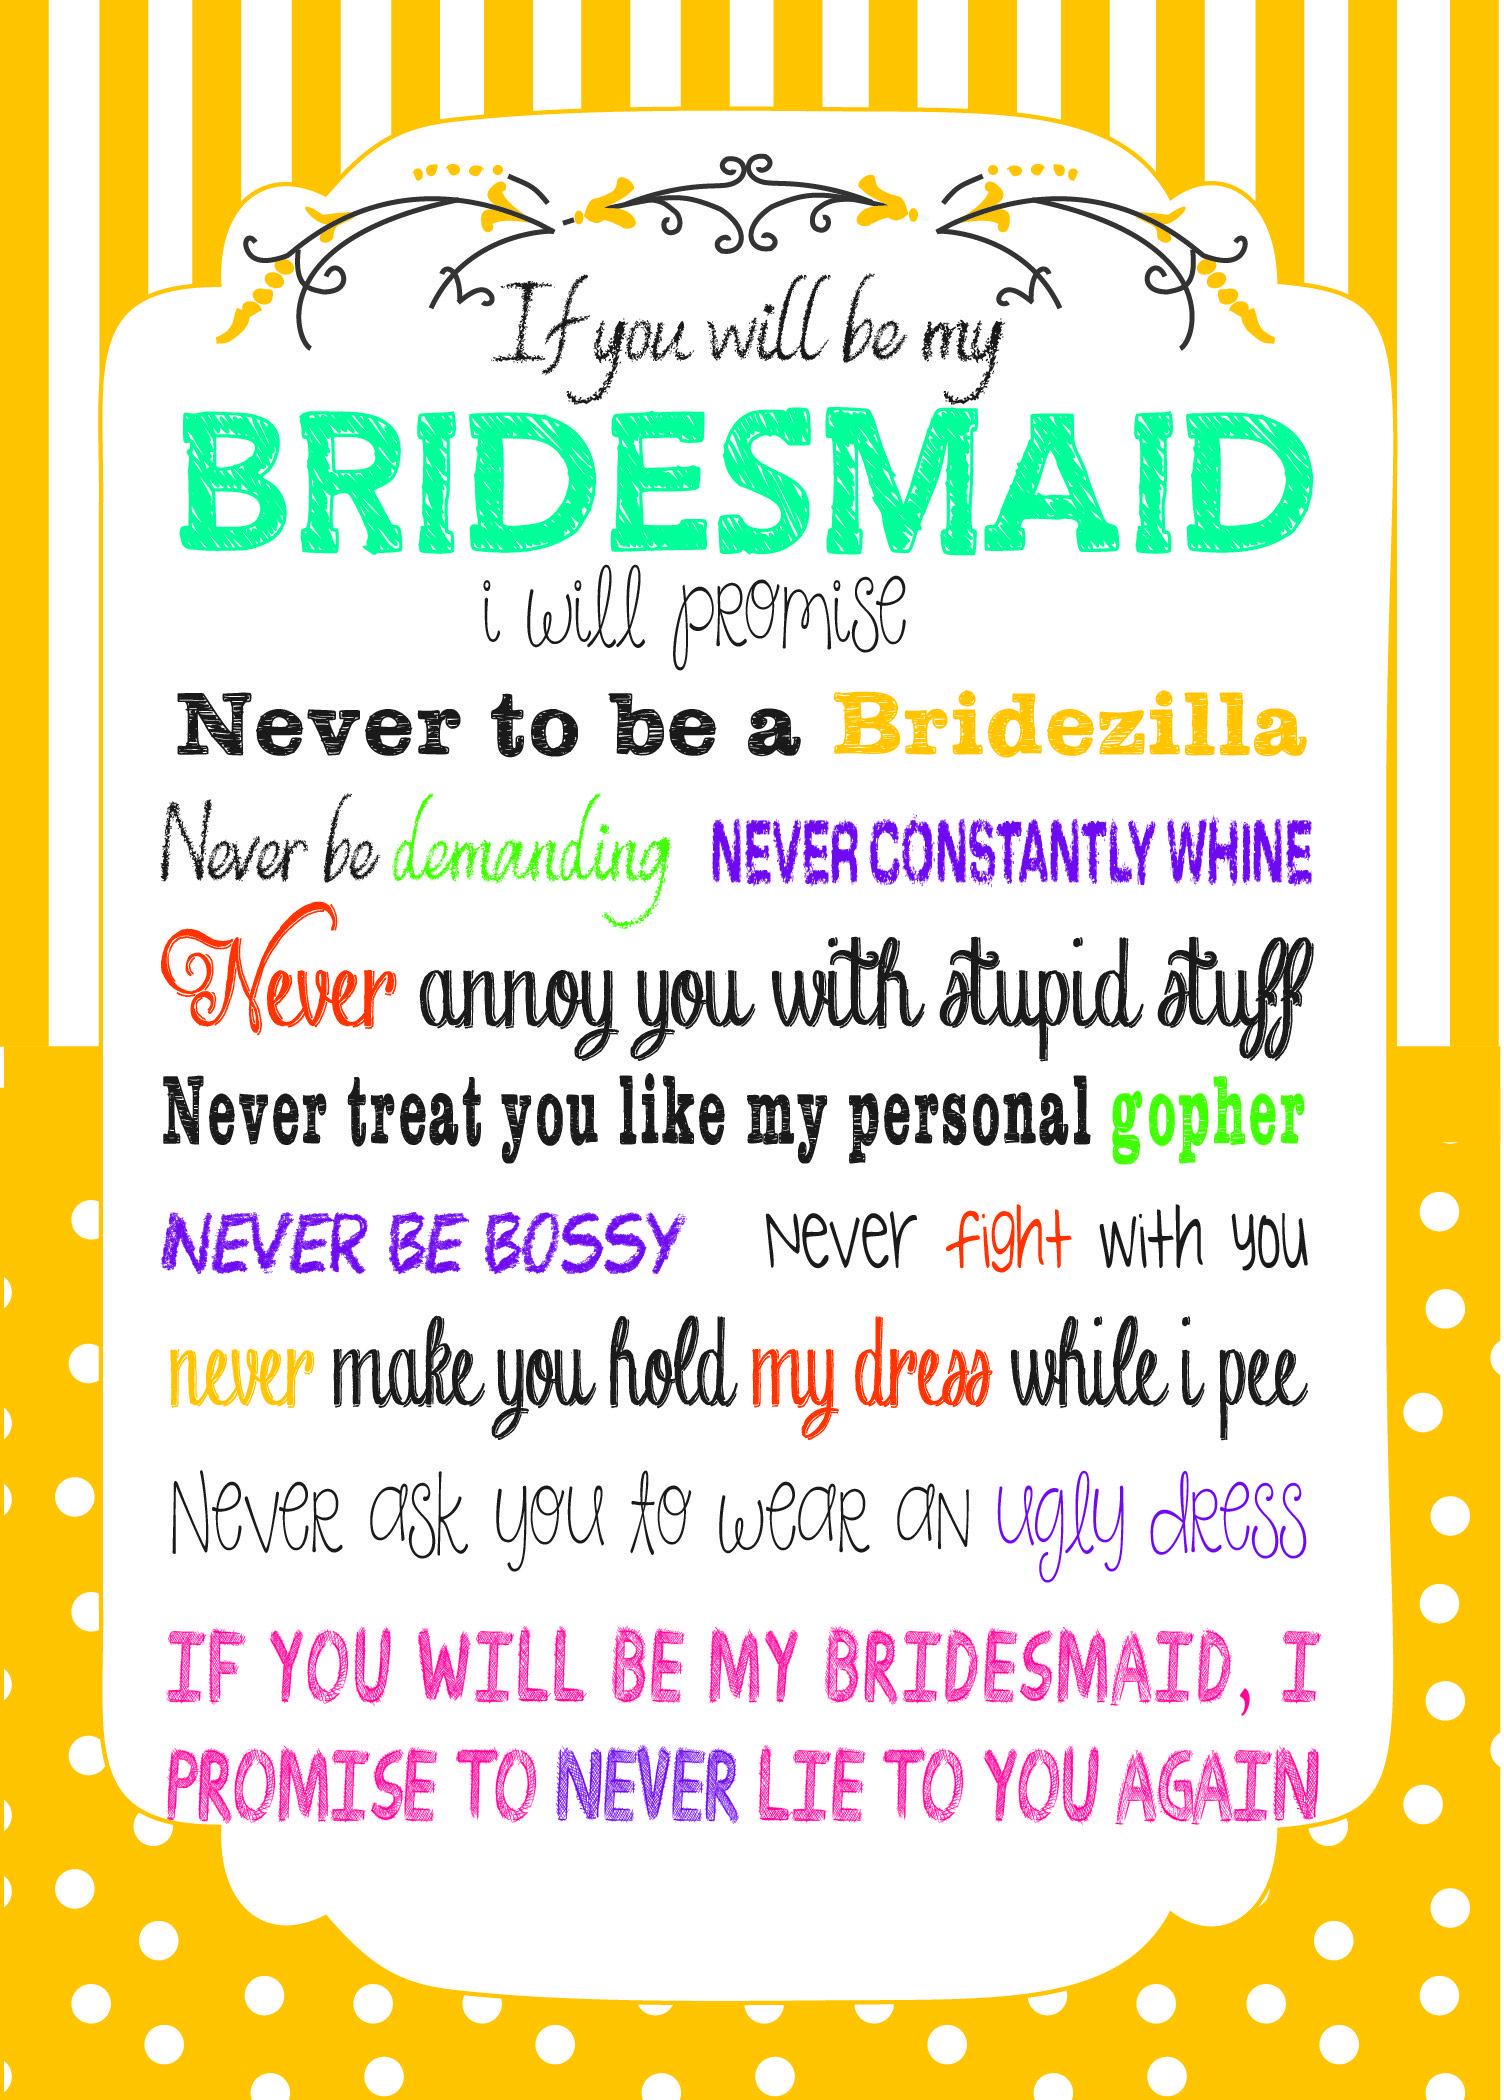 Honey Sayings for Wedding Favors   Giftwedding.co